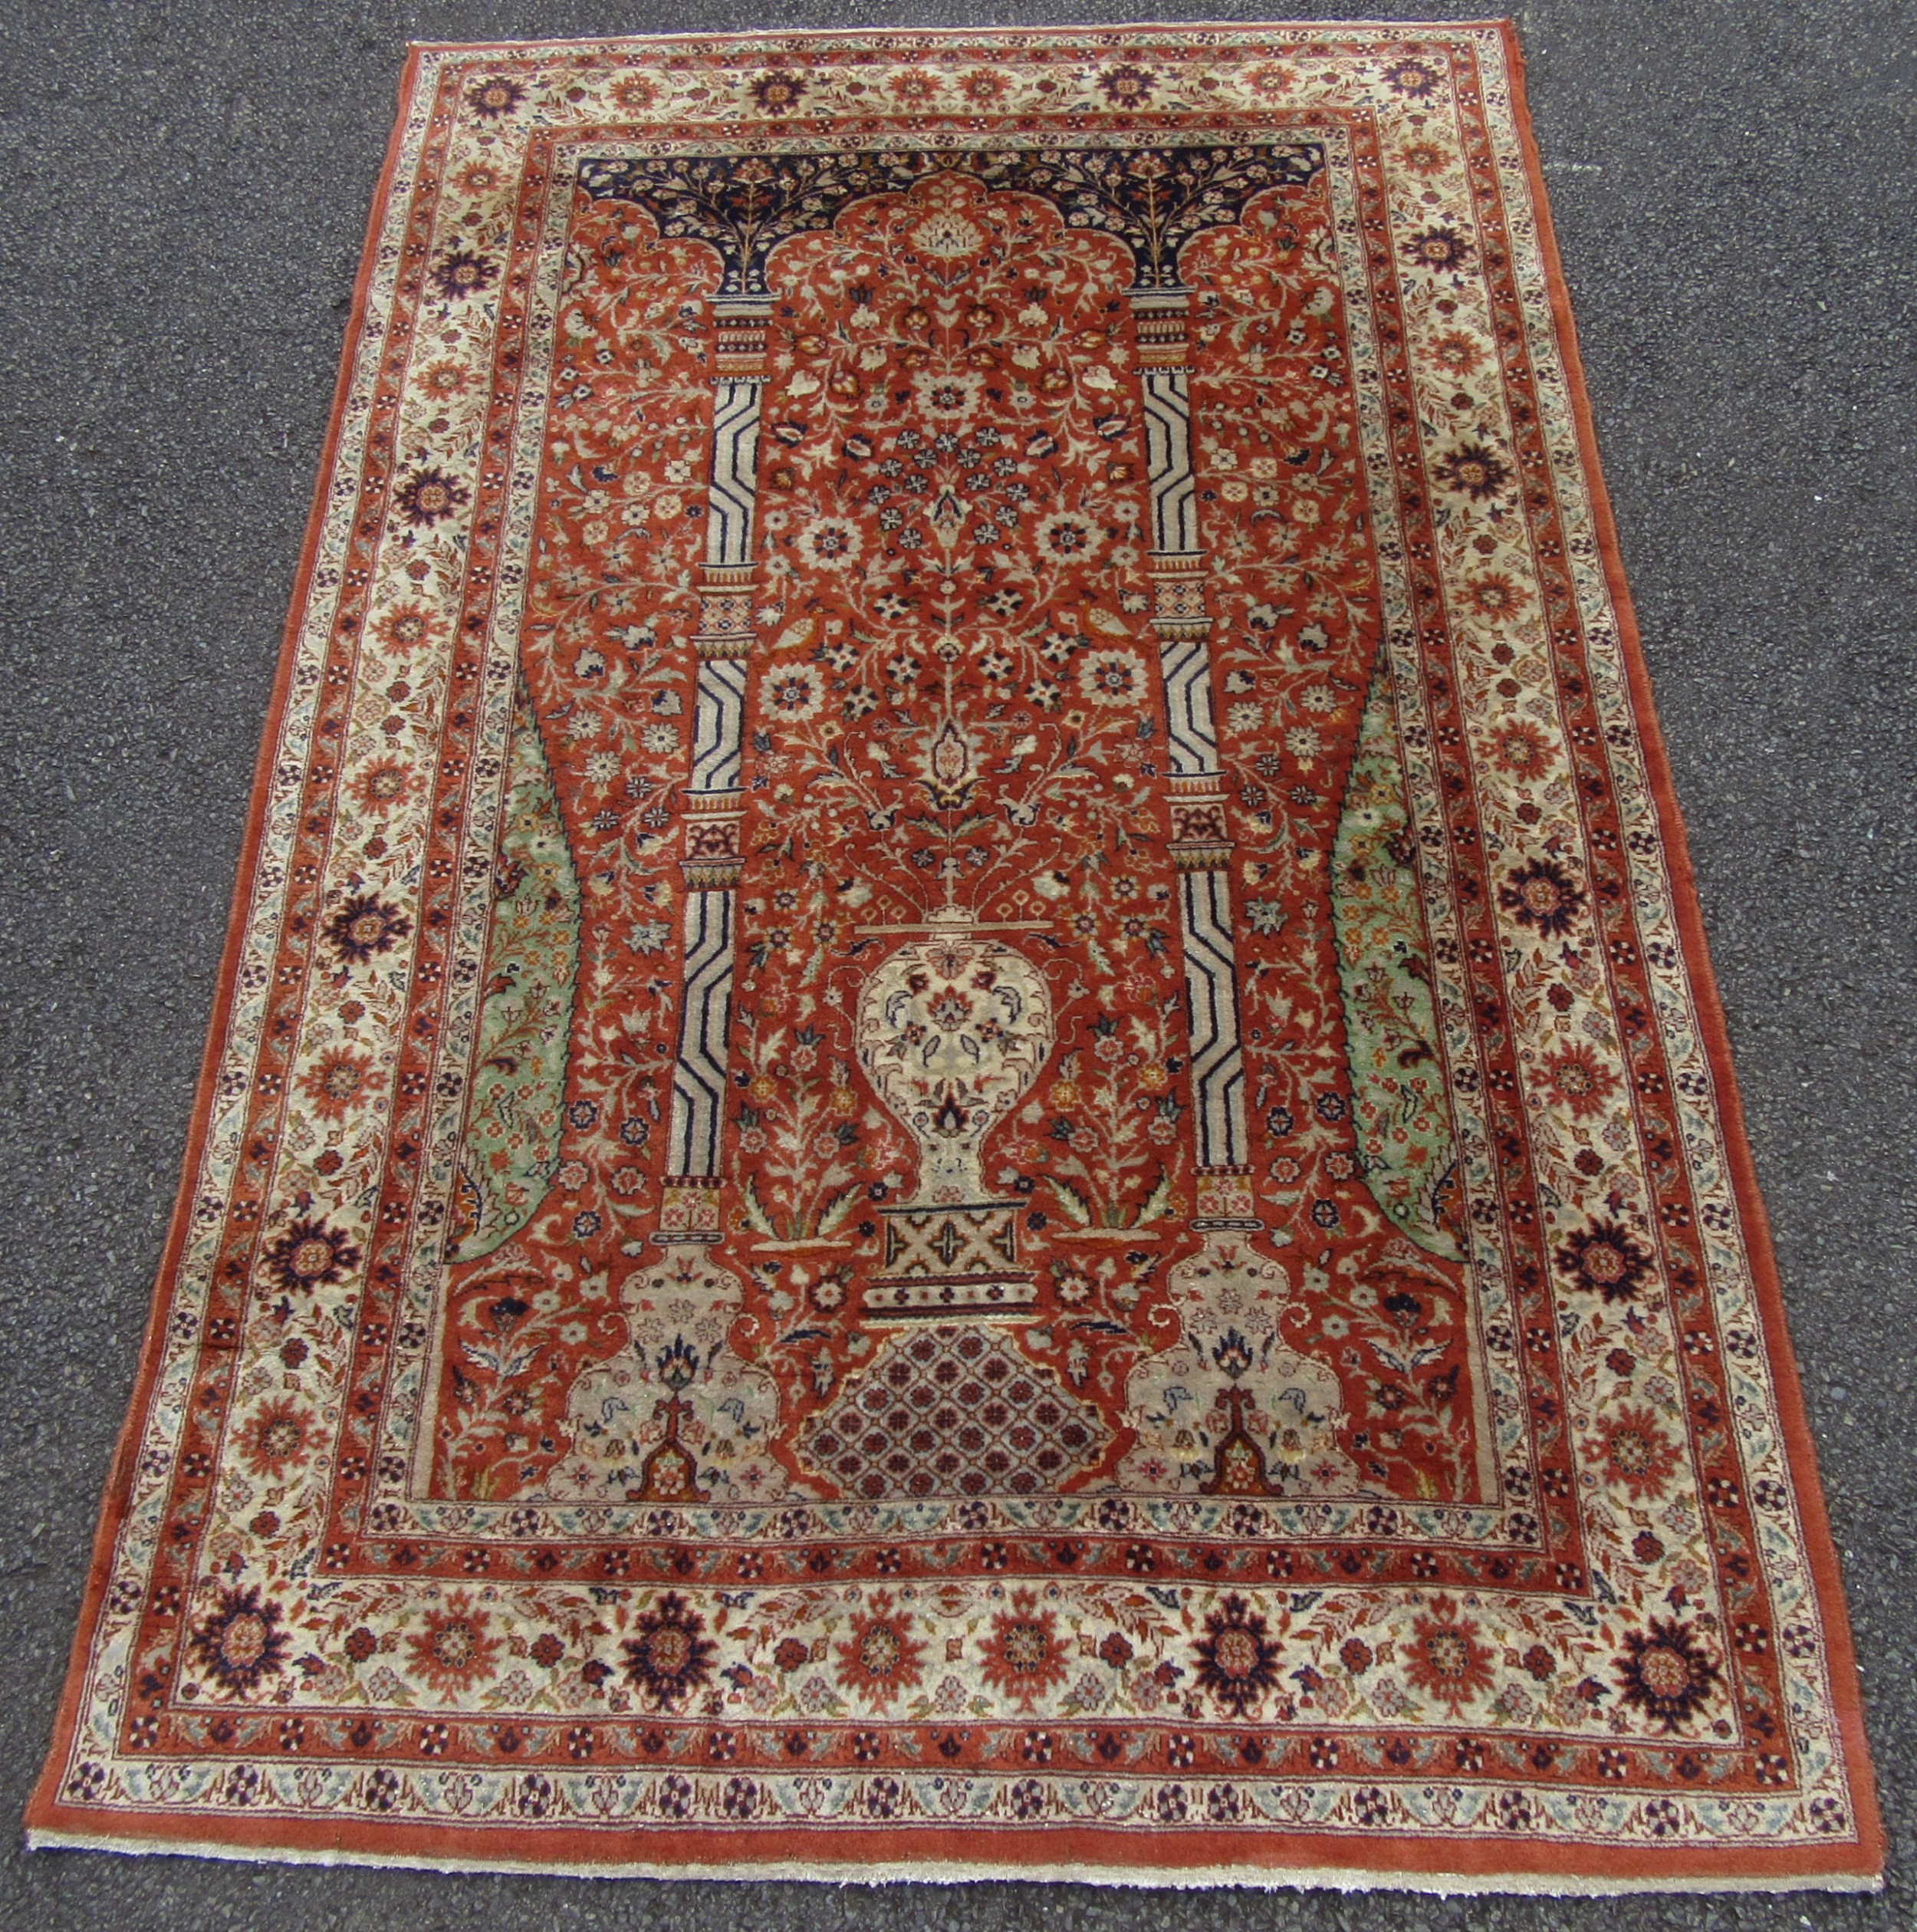 an attractive antique indian agra prayer rug of persian kirman rug design velvety wool pile